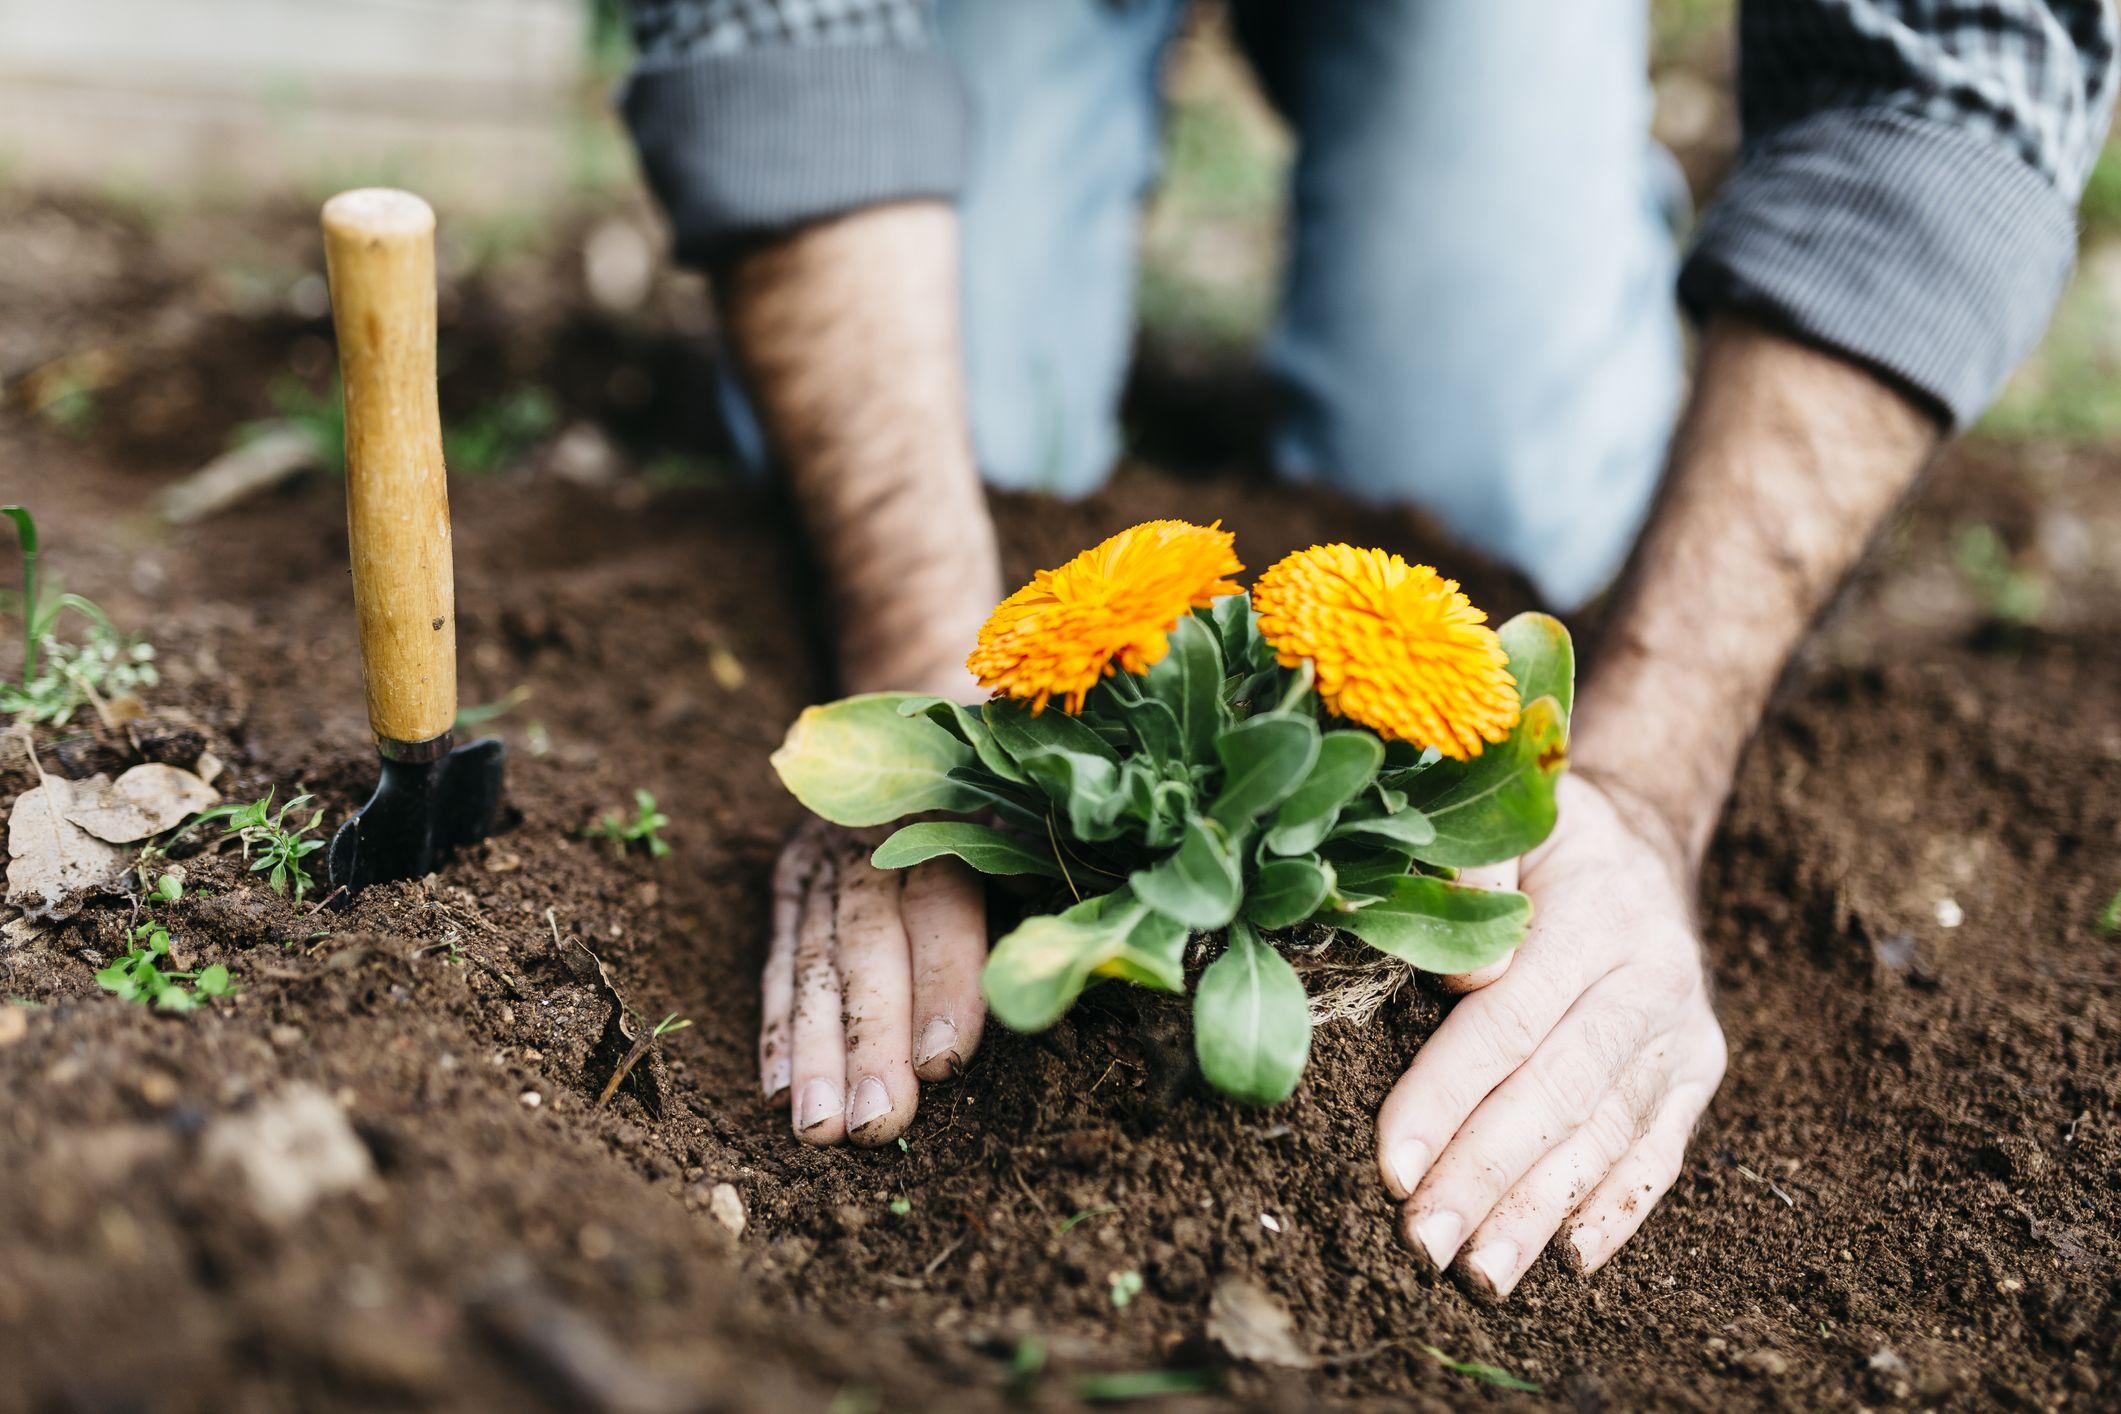 National Trust Gardening Gift    Hand Fork and Gloves